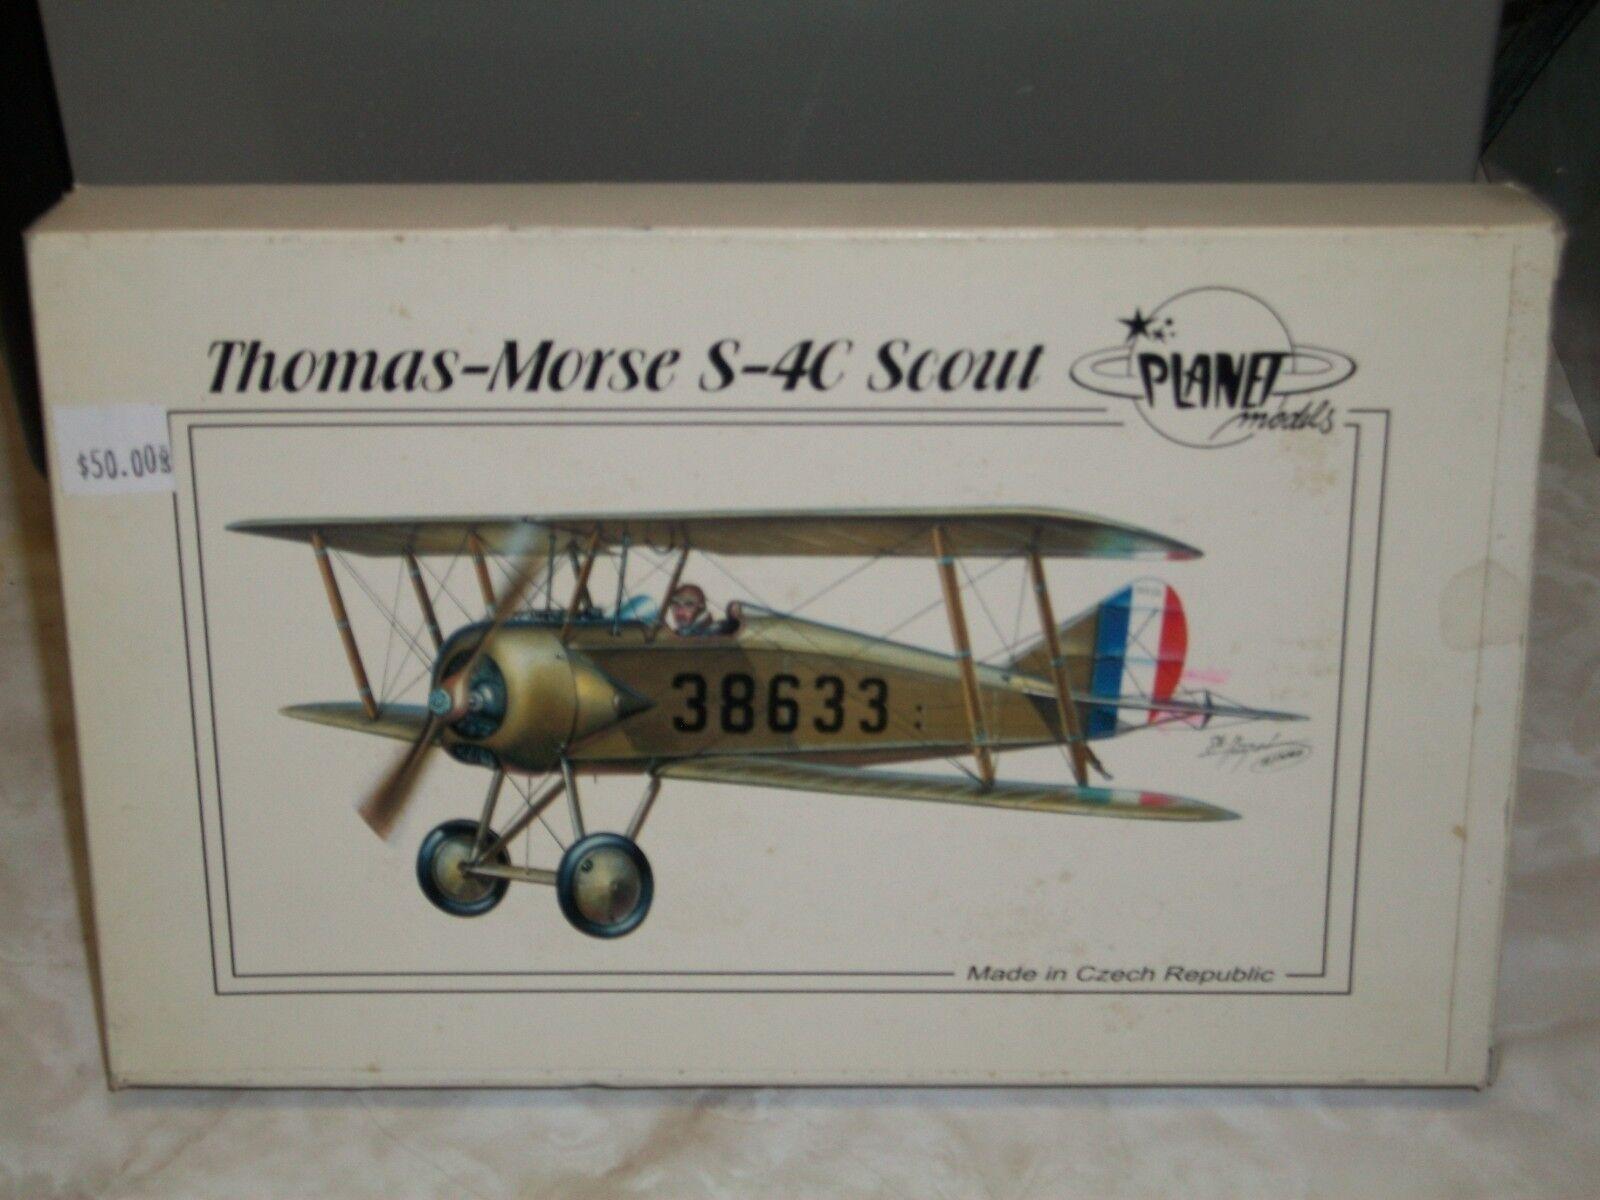 Planet 1 48 Scale Resin Thomas-Morse S-4C Scout